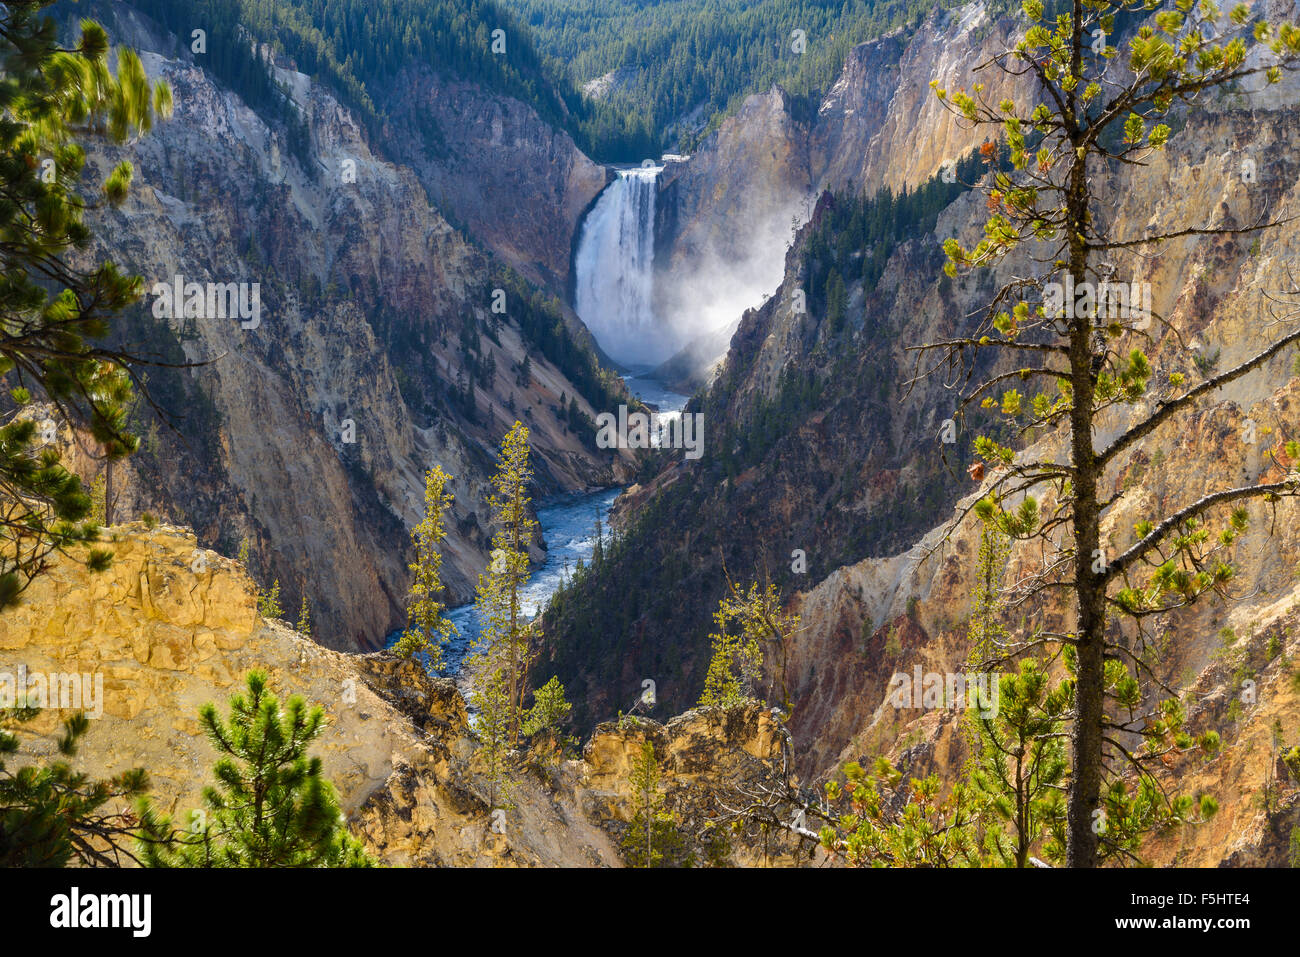 Lower Falls et Grand Canyon de la Yellowstone, provenant d'artistes Point, le Parc National de Yellowstone, Photo Stock